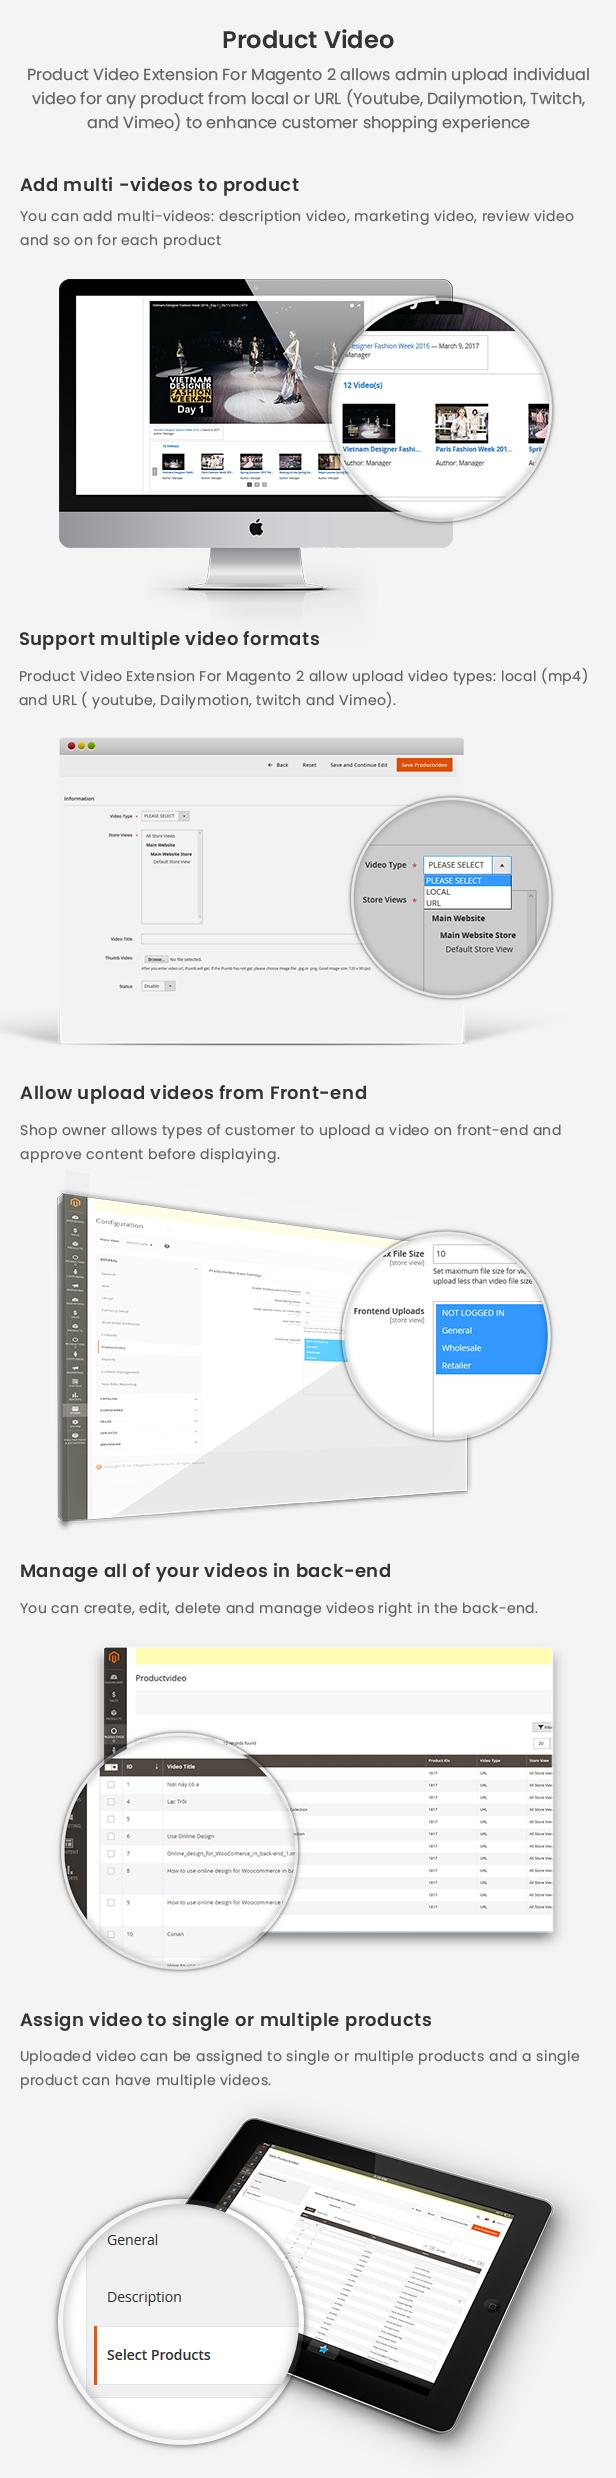 Printshop - Responsive Magento Printing Theme - 40